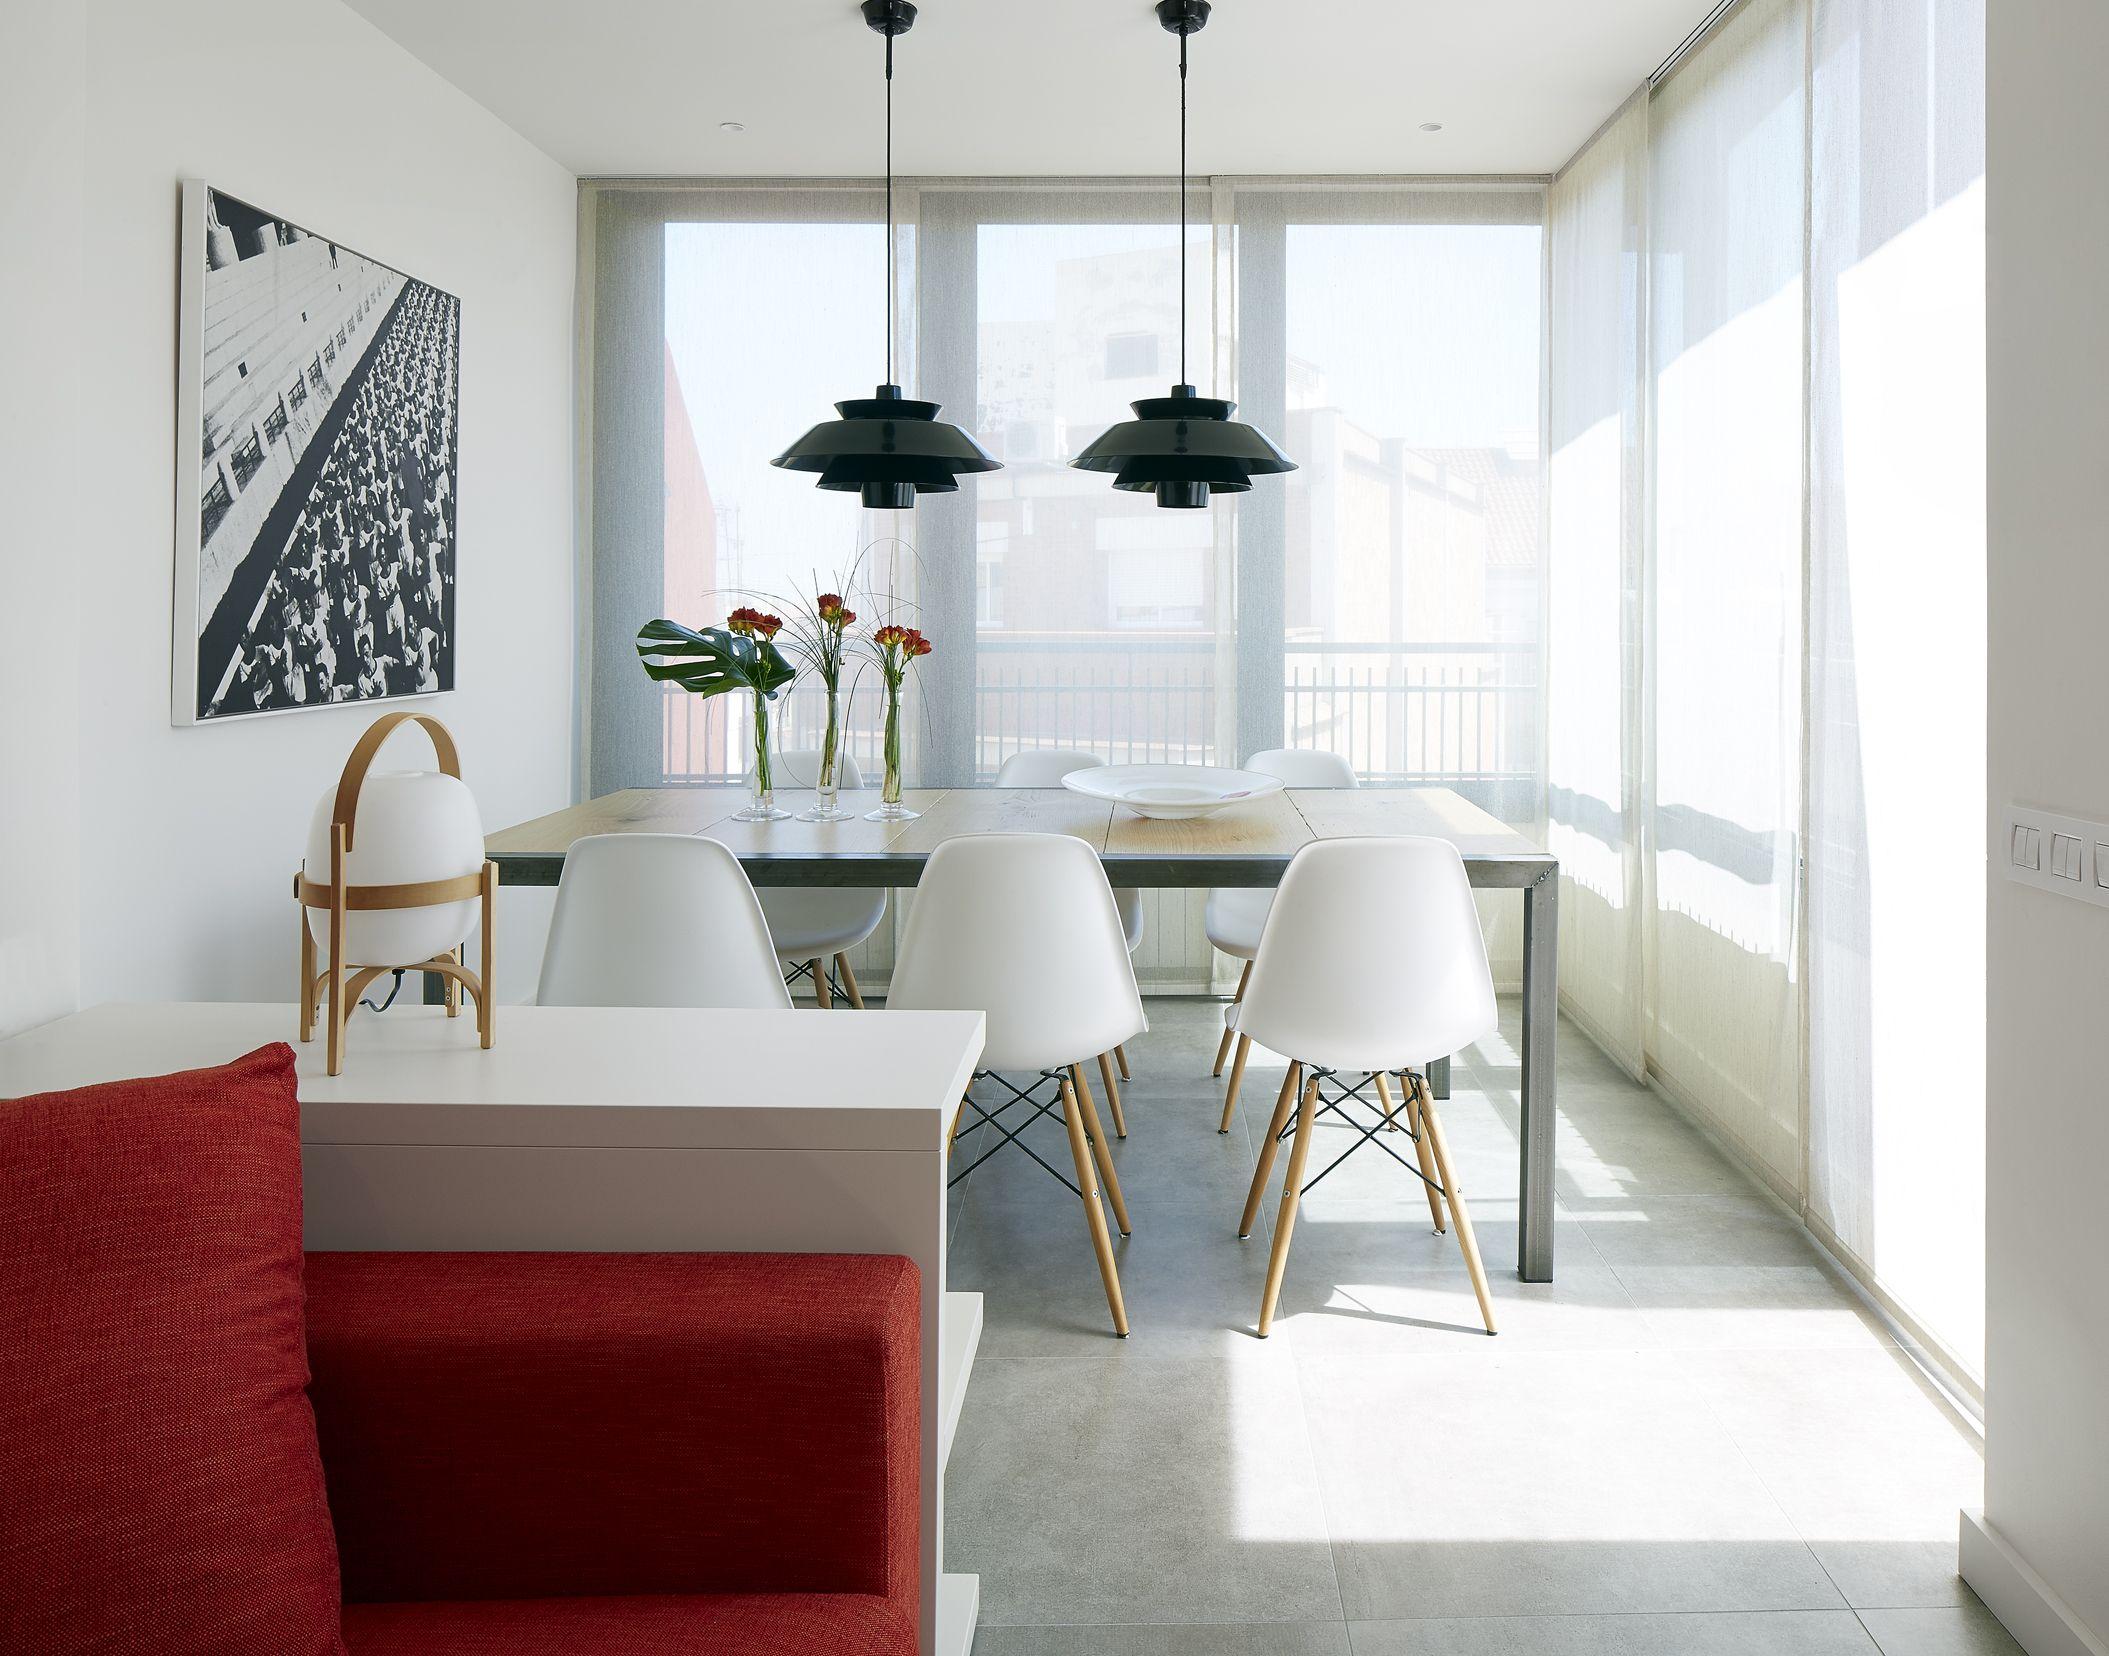 Salon Comedor De Diseño | Molins Interiors Arquitectura Interior Interiorismo